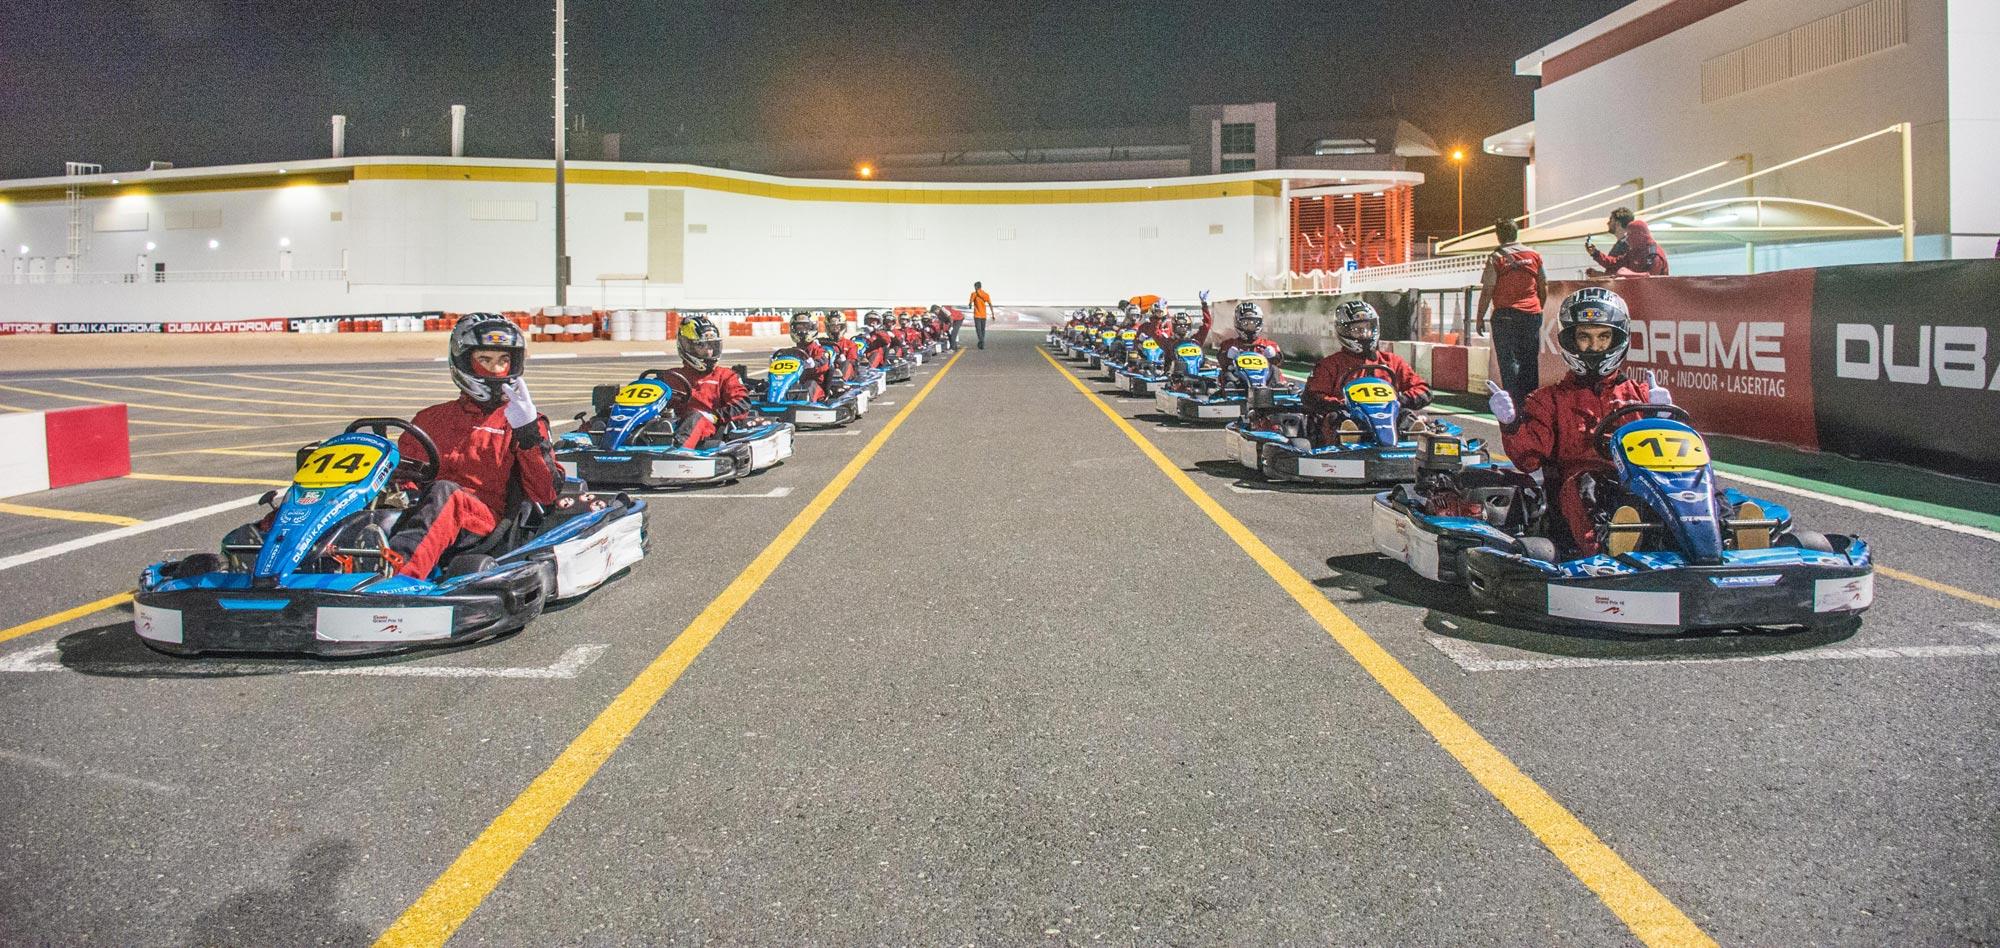 Outdoor Kartdrome in Dubai on Wednesday 9th November